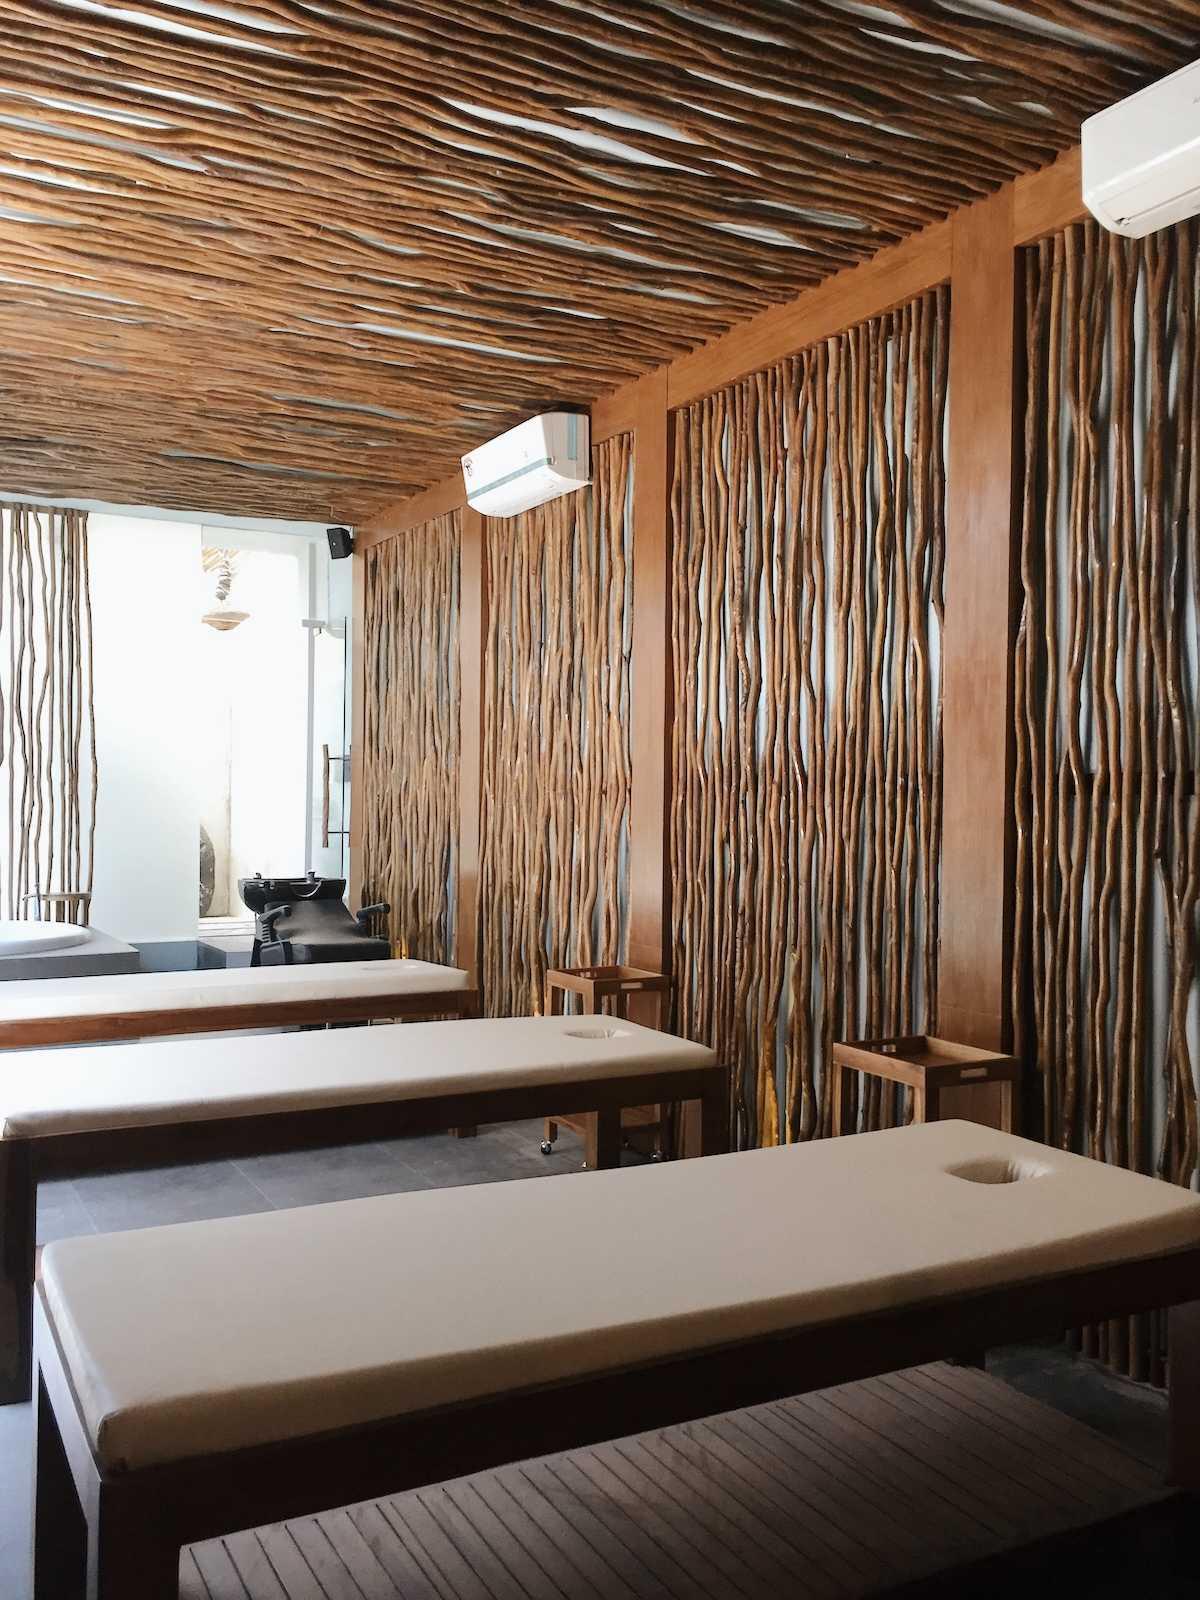 Sume Interior Taman Air Spa Jl. Sunset Road No.88, Kuta, Kabupaten Badung, Bali 80361, Indonesia Jl. Sunset Road No.88, Kuta, Kabupaten Badung, Bali 80361, Indonesia Sume-Interior-Taman-Air-Spa-Treatment-Room  101118